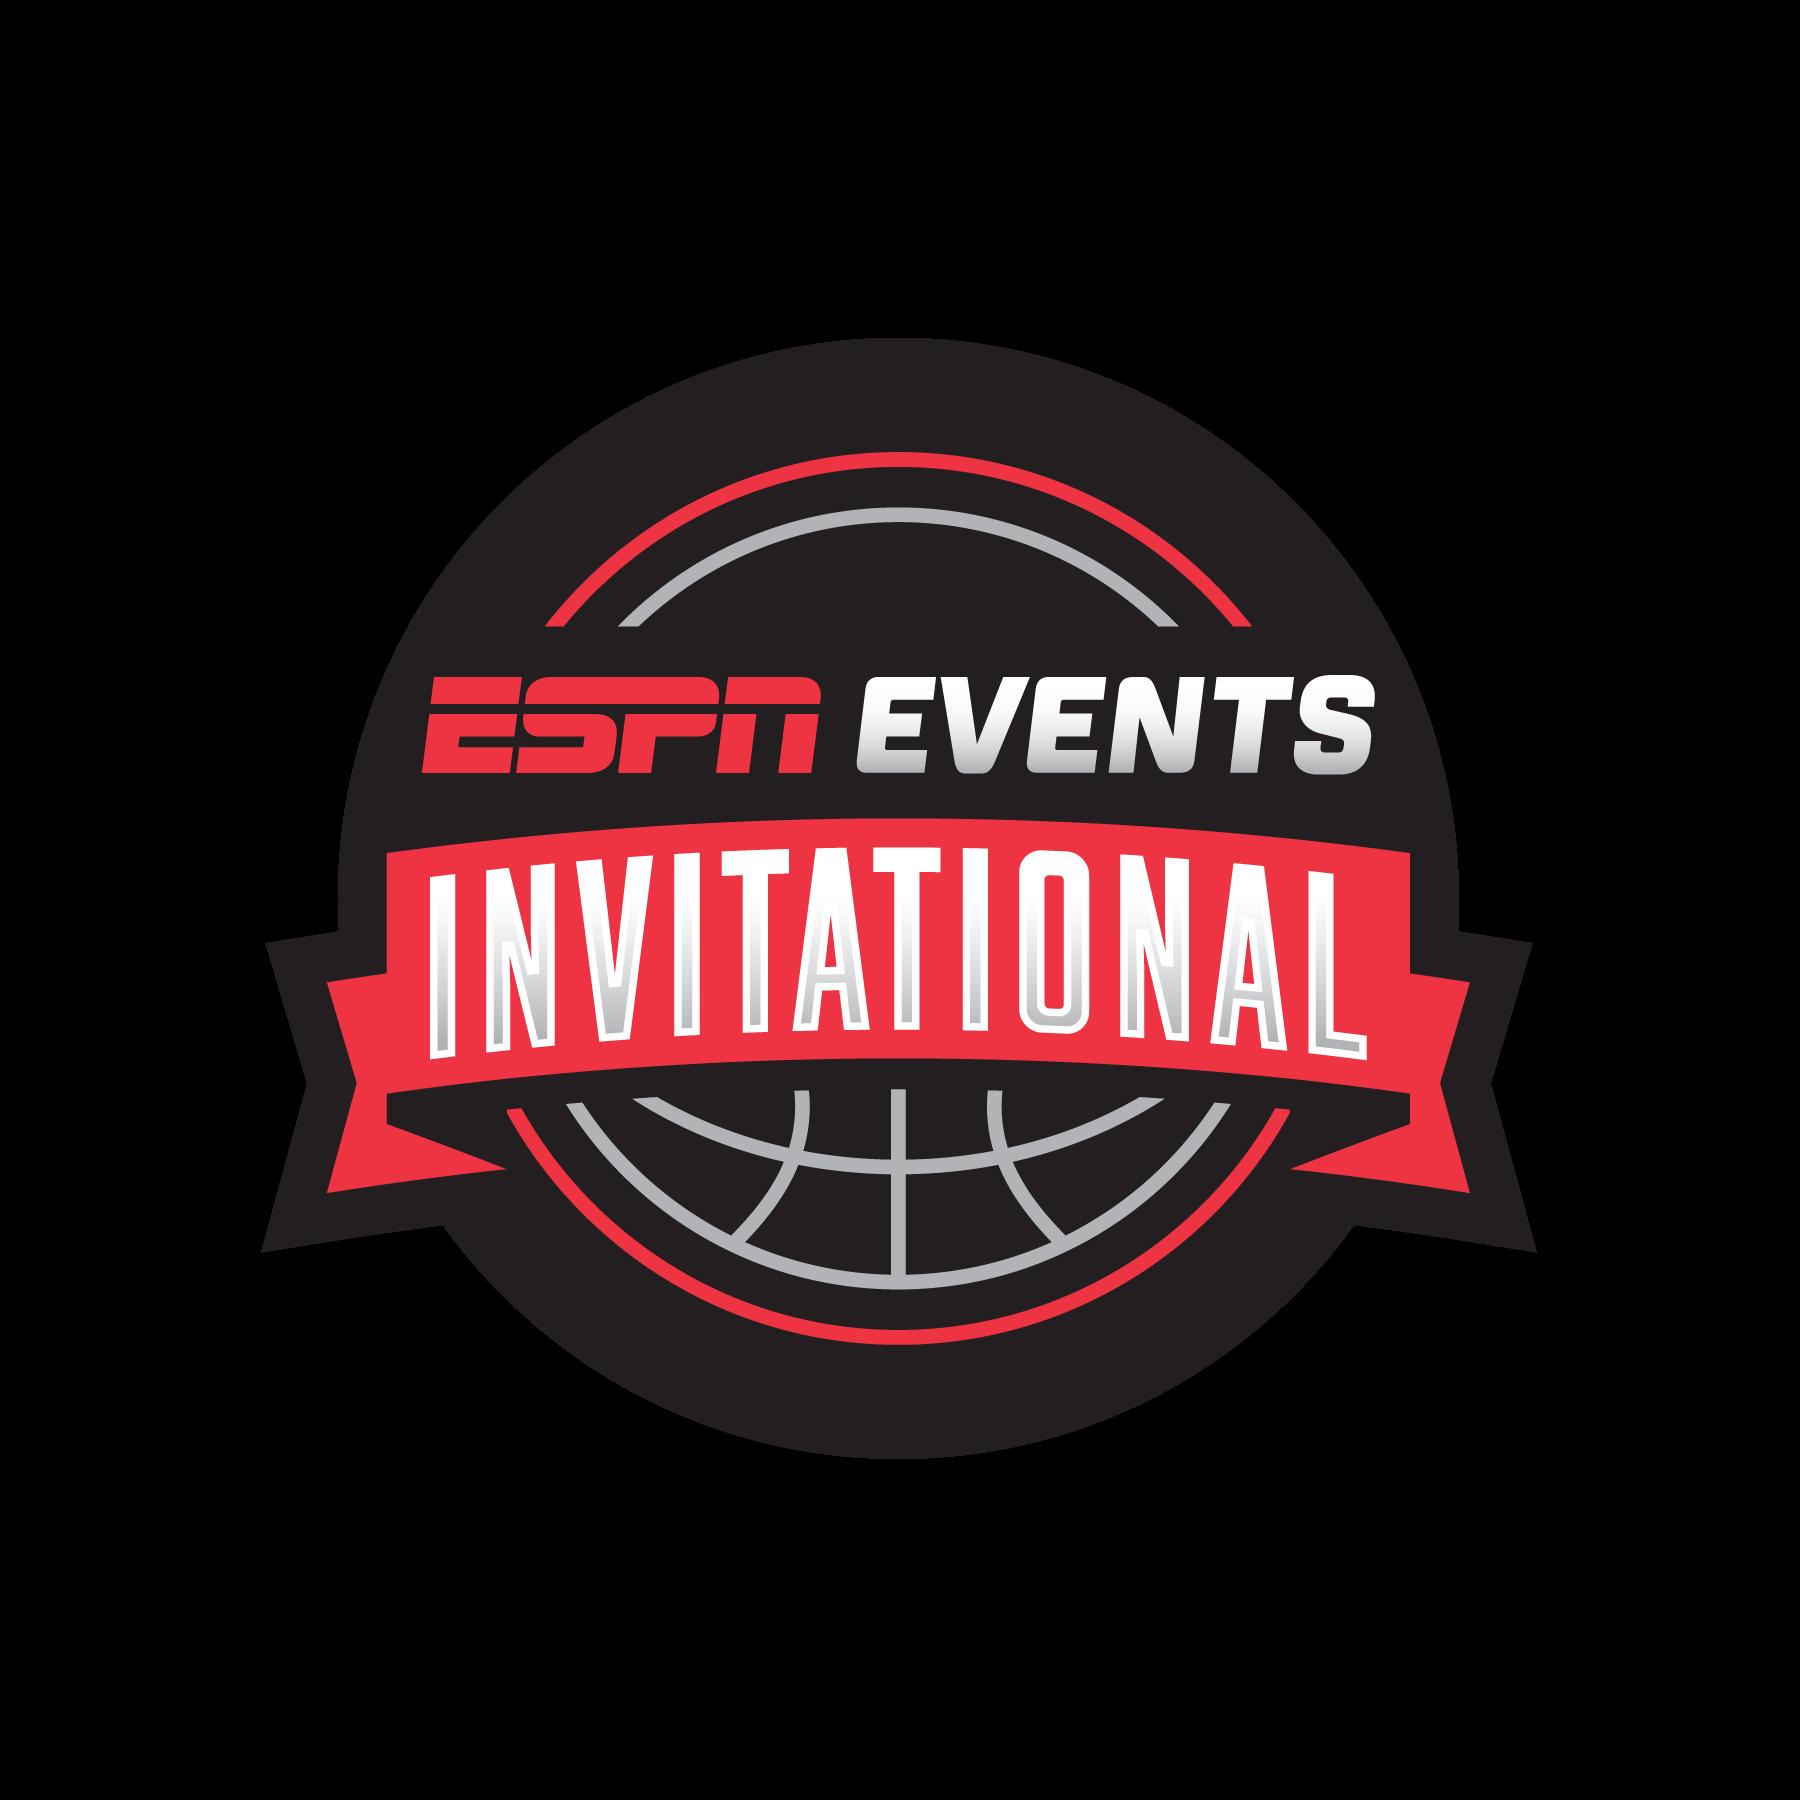 ESPN Events Invitational